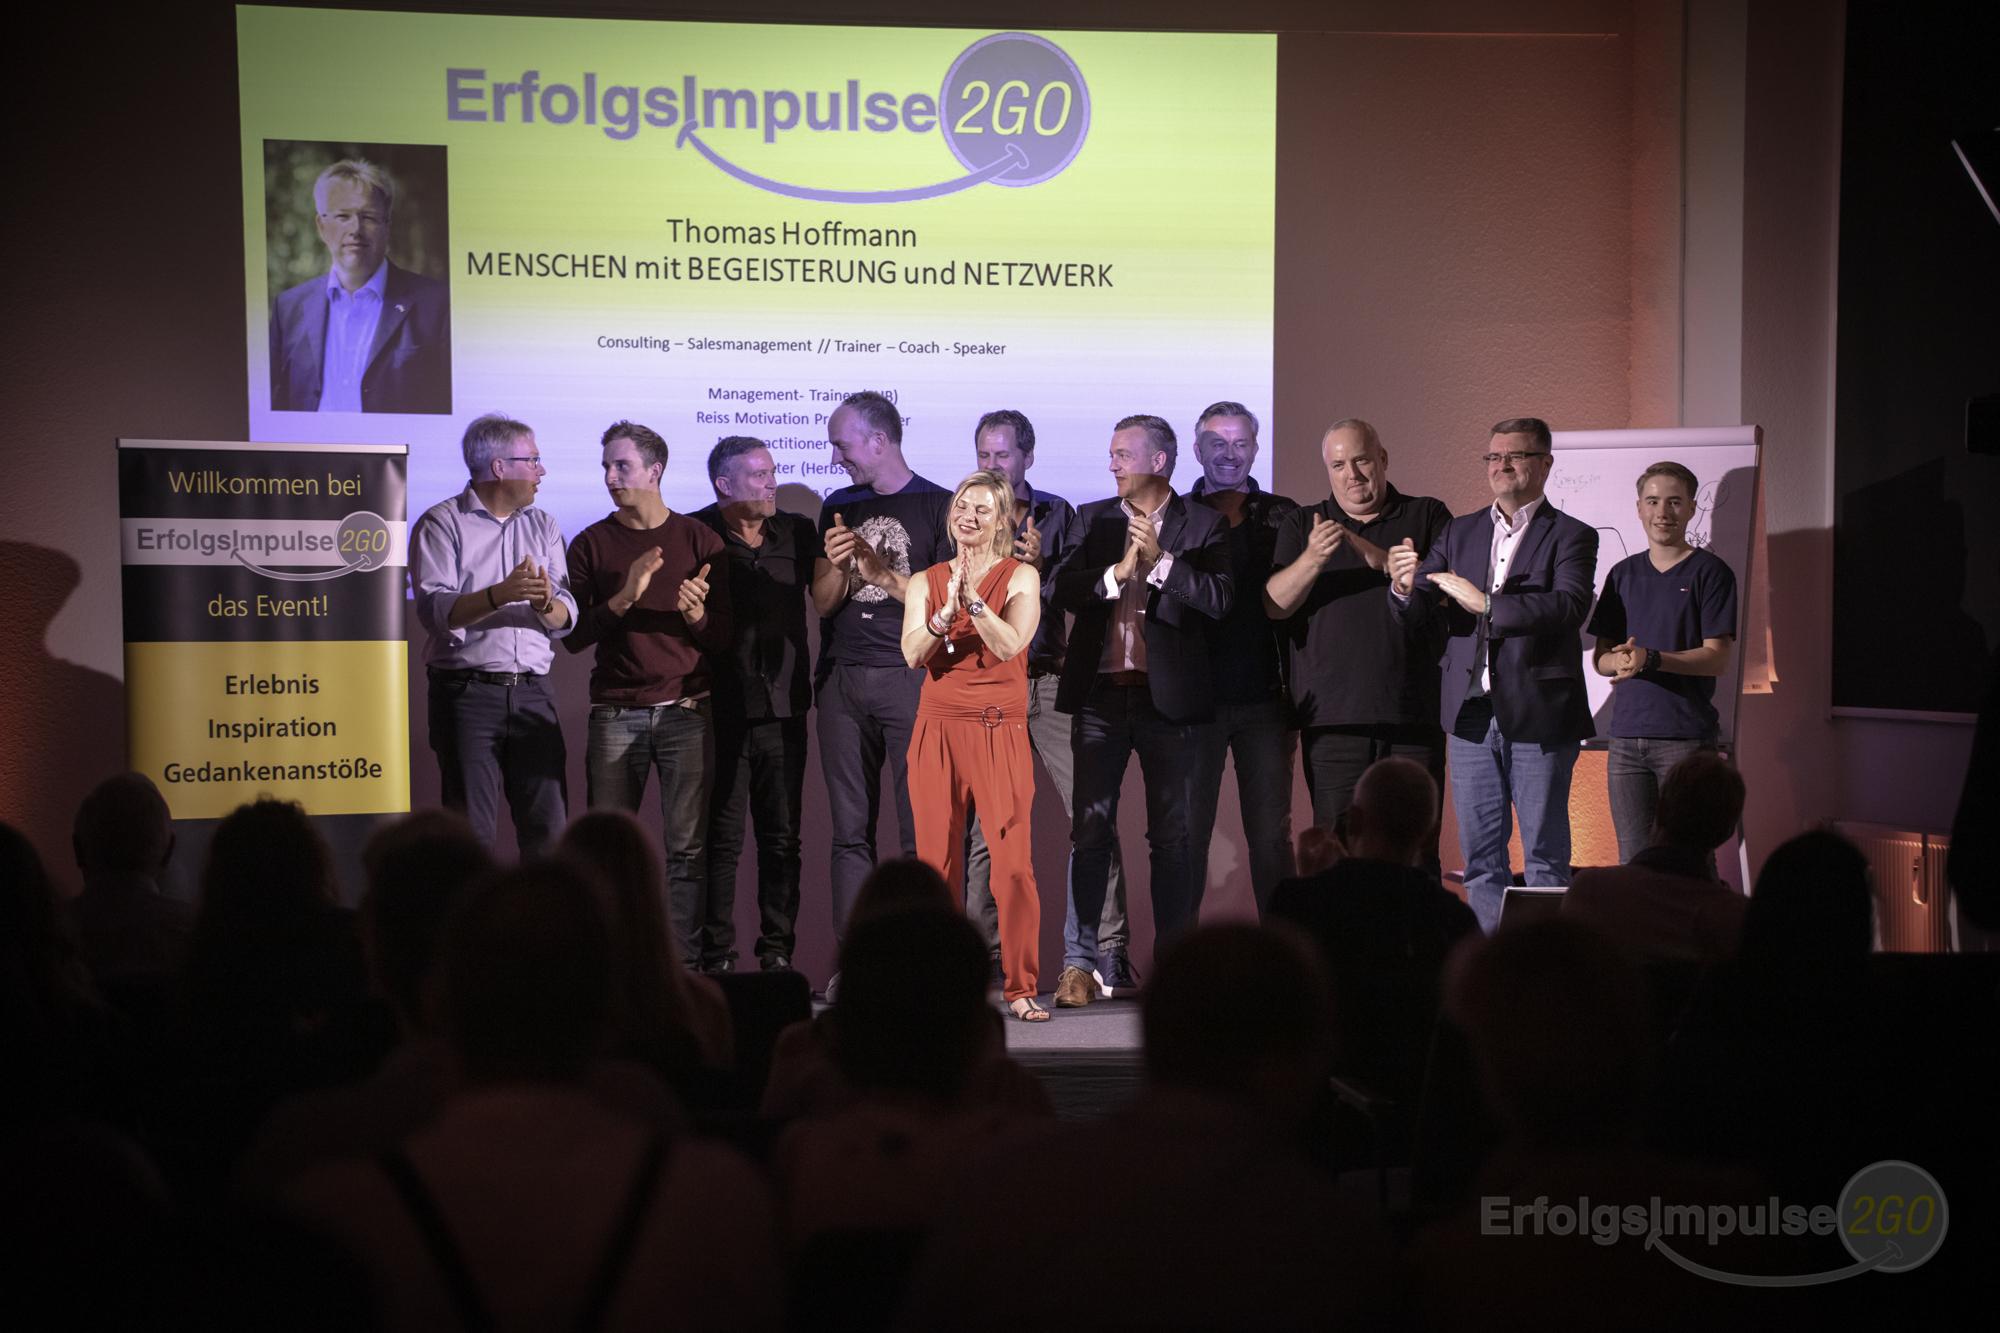 _32A4278--erfolgsimpulse2go-gronau-2018--WEB-NEU